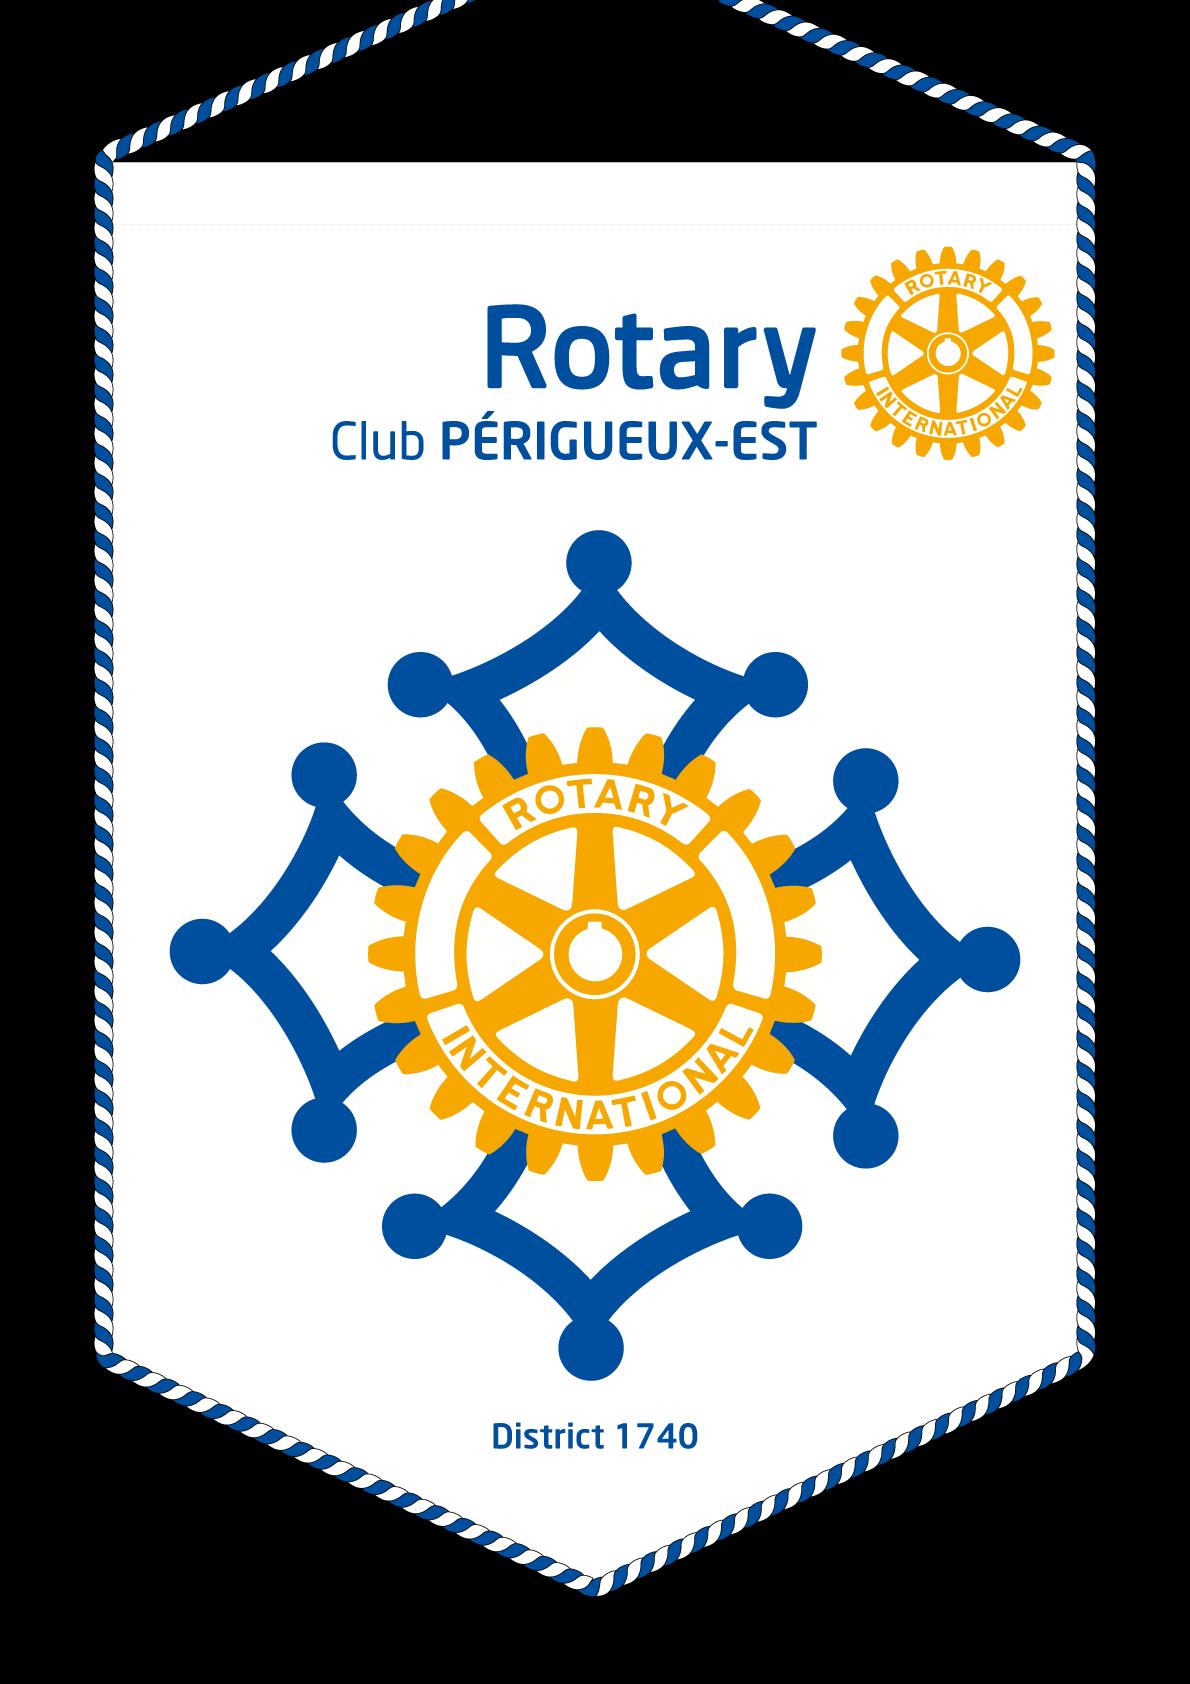 FANION ROTARY CLUB PERIGUEUX EST